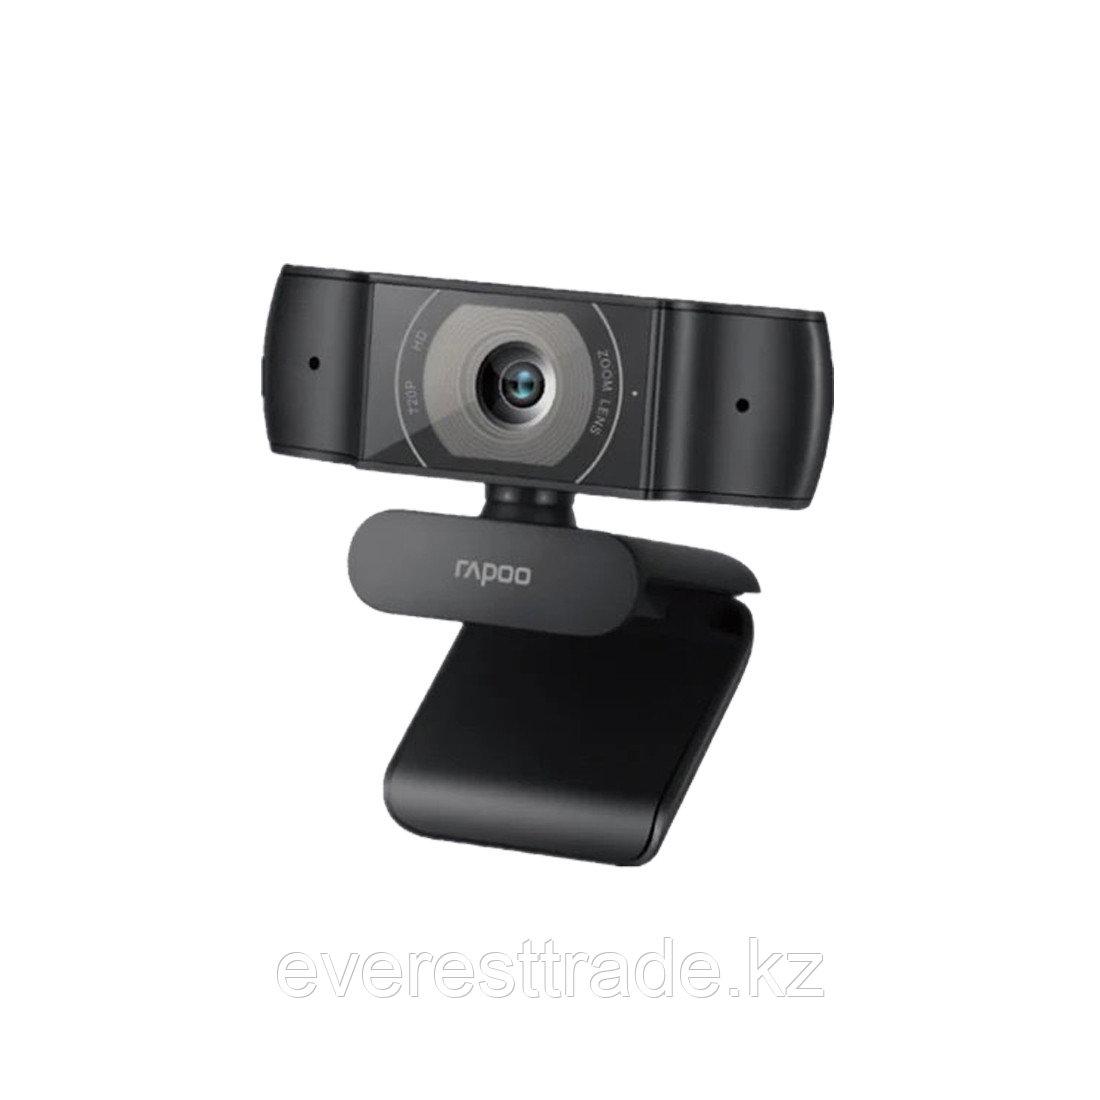 Rapoo Веб камера Rapoo C200, USB 2.0, 2.0Mpx